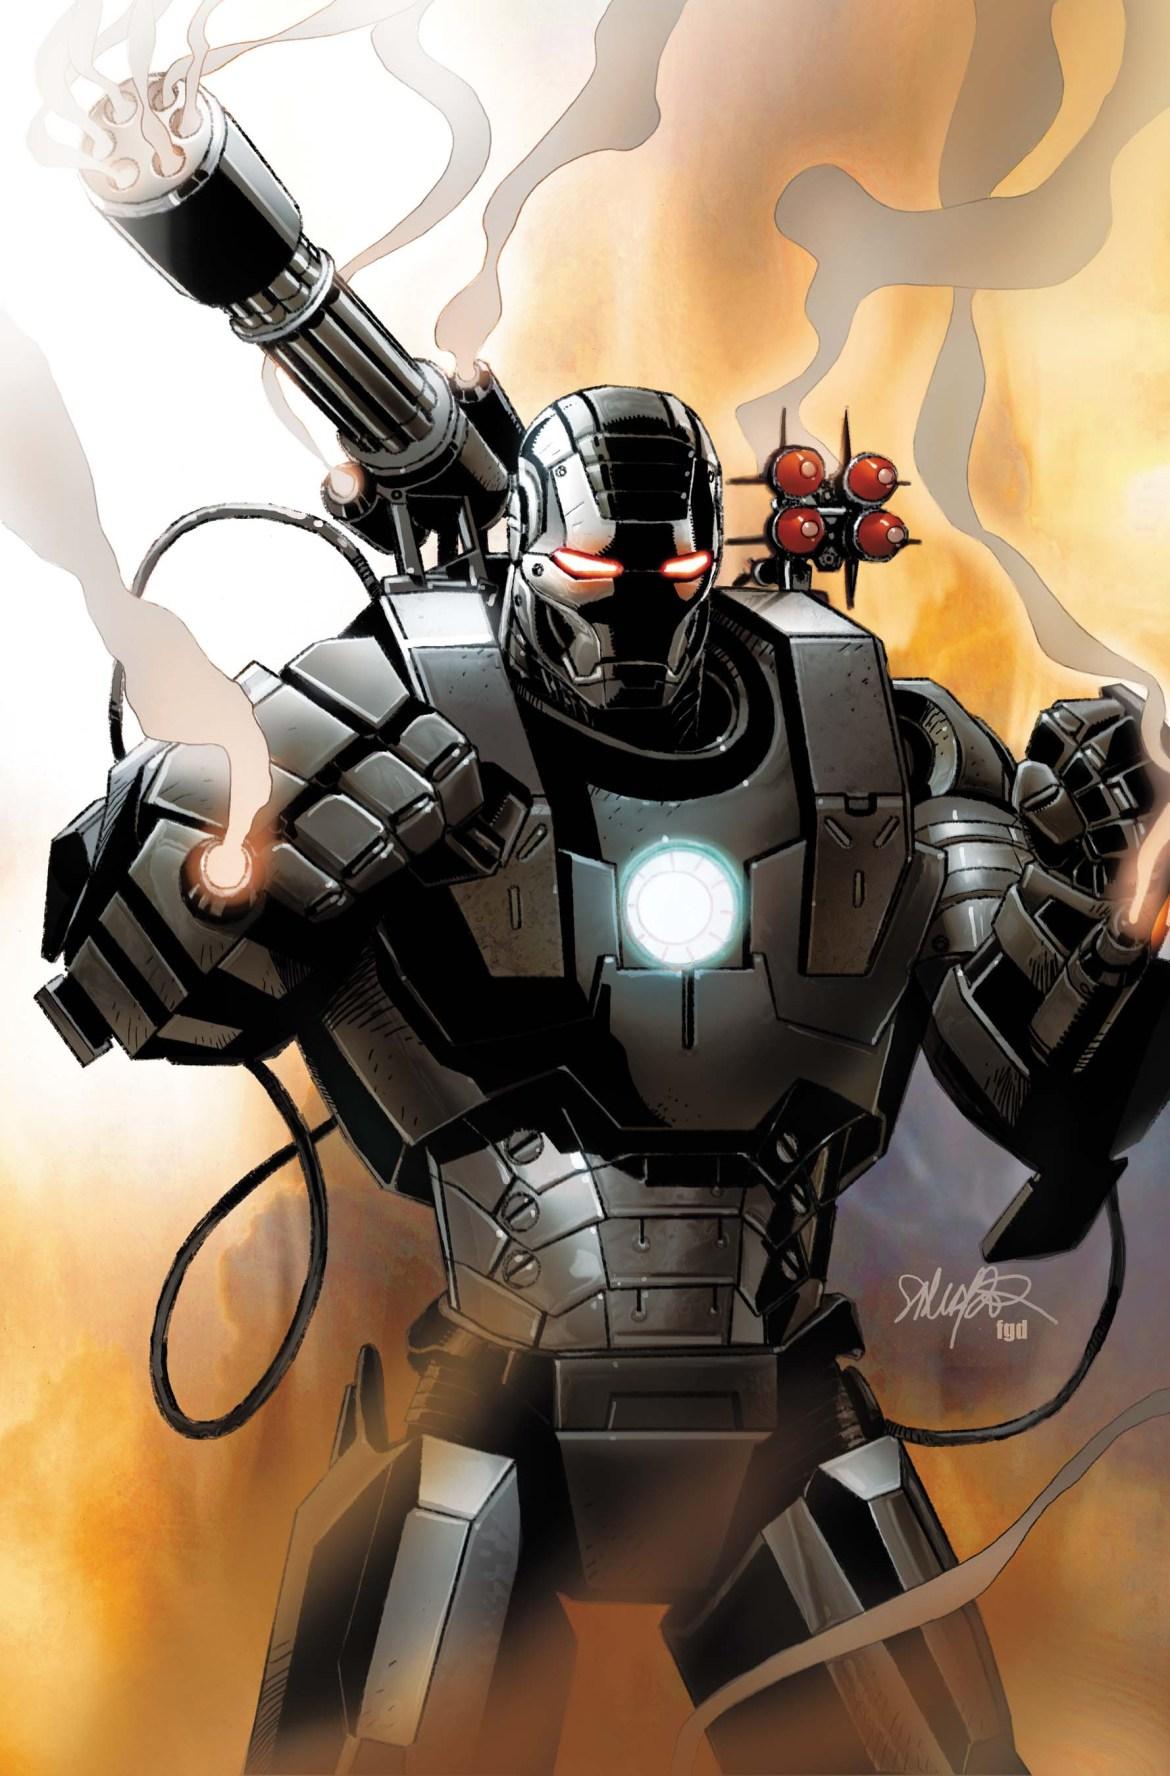 IM20_1_Cover Iron Man 2.0: War Machine Evolved